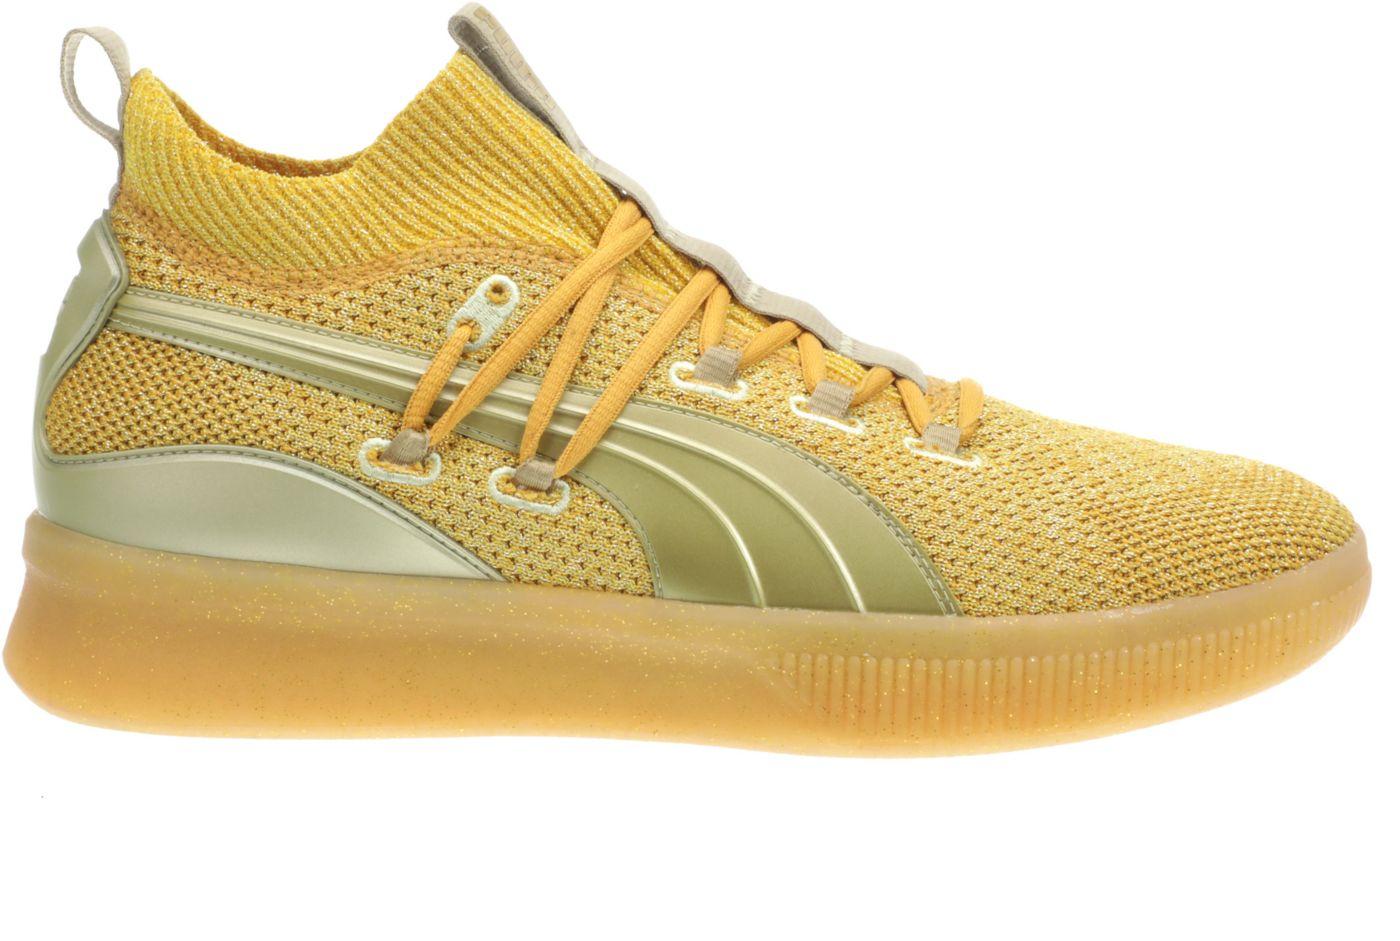 PUMA Clyde Court Basketball Shoes